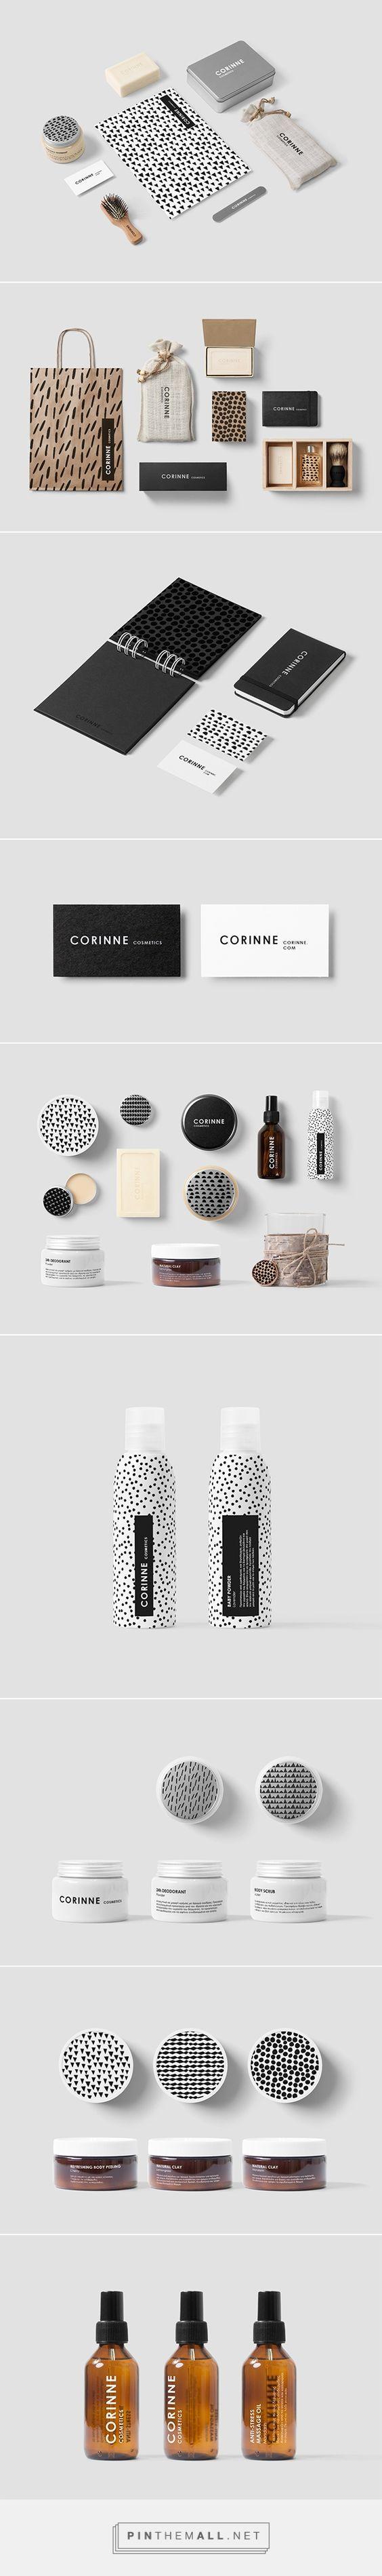 Corinne Cosmetics Packaging on Behance | Fivestar Branding – Design and Branding Agency & Inspiration Gallery